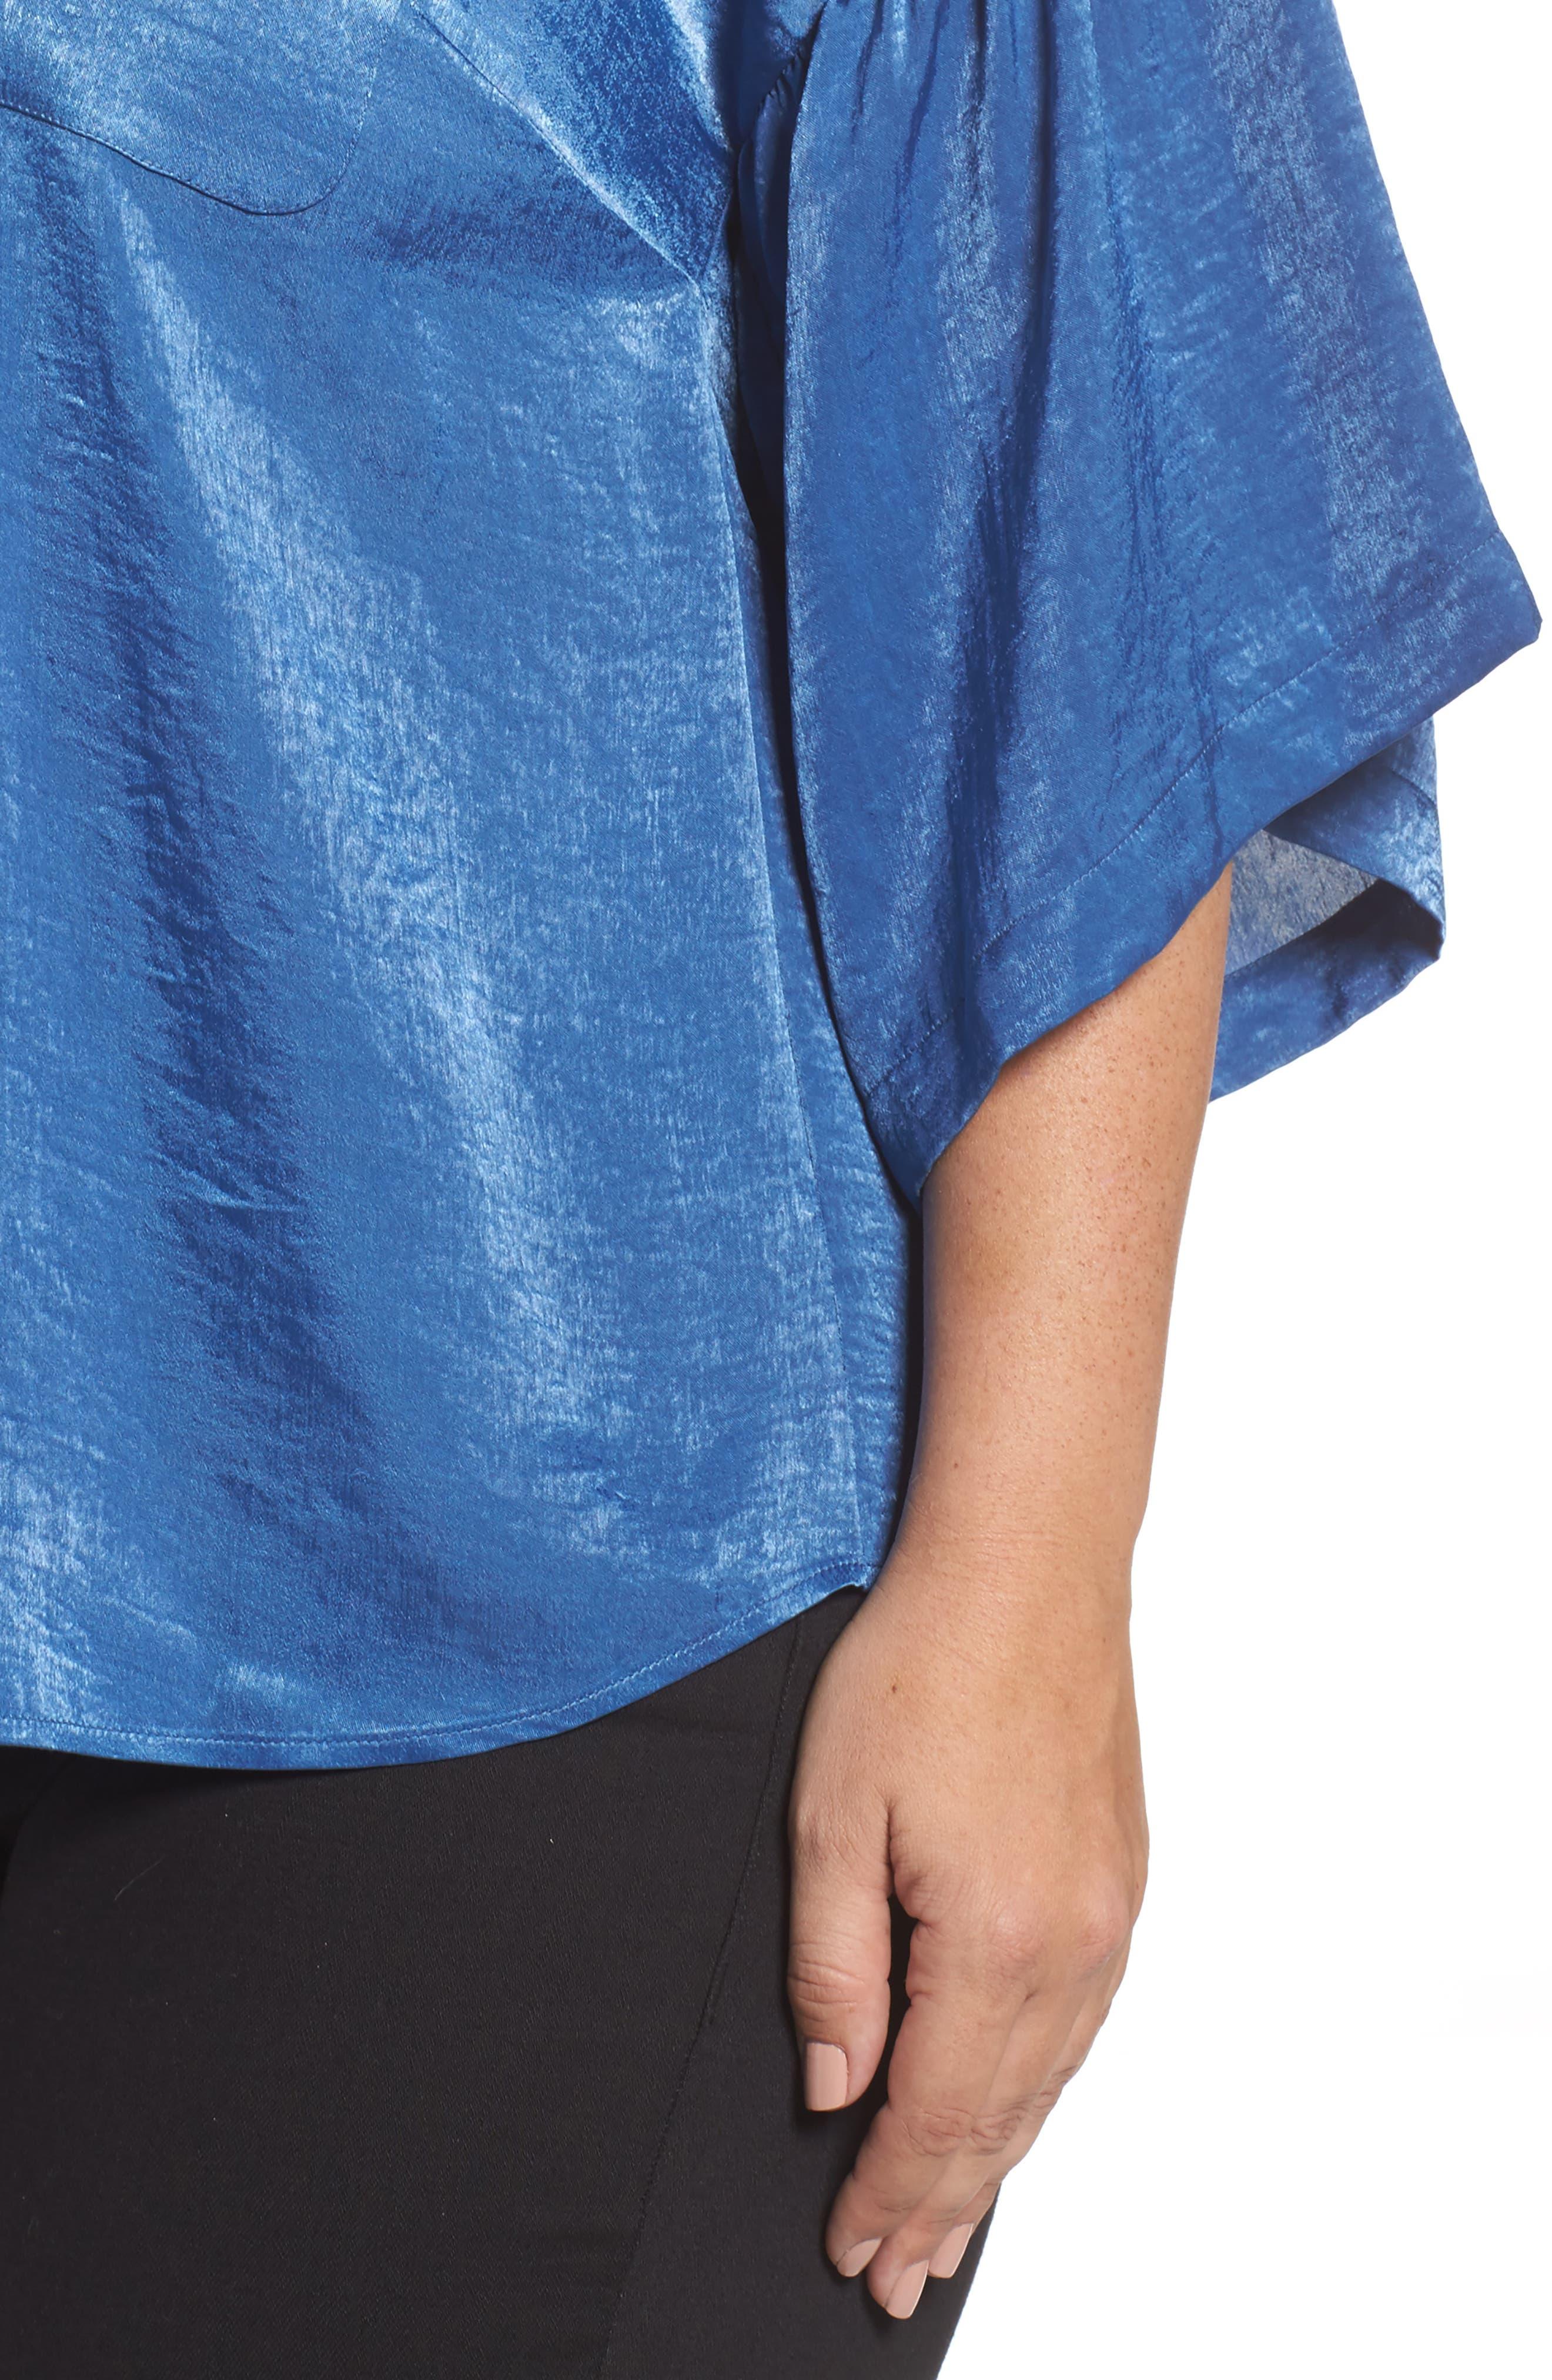 Bell Sleeve Rumpled Satin Blouse,                             Alternate thumbnail 4, color,                             322-Divine Blue